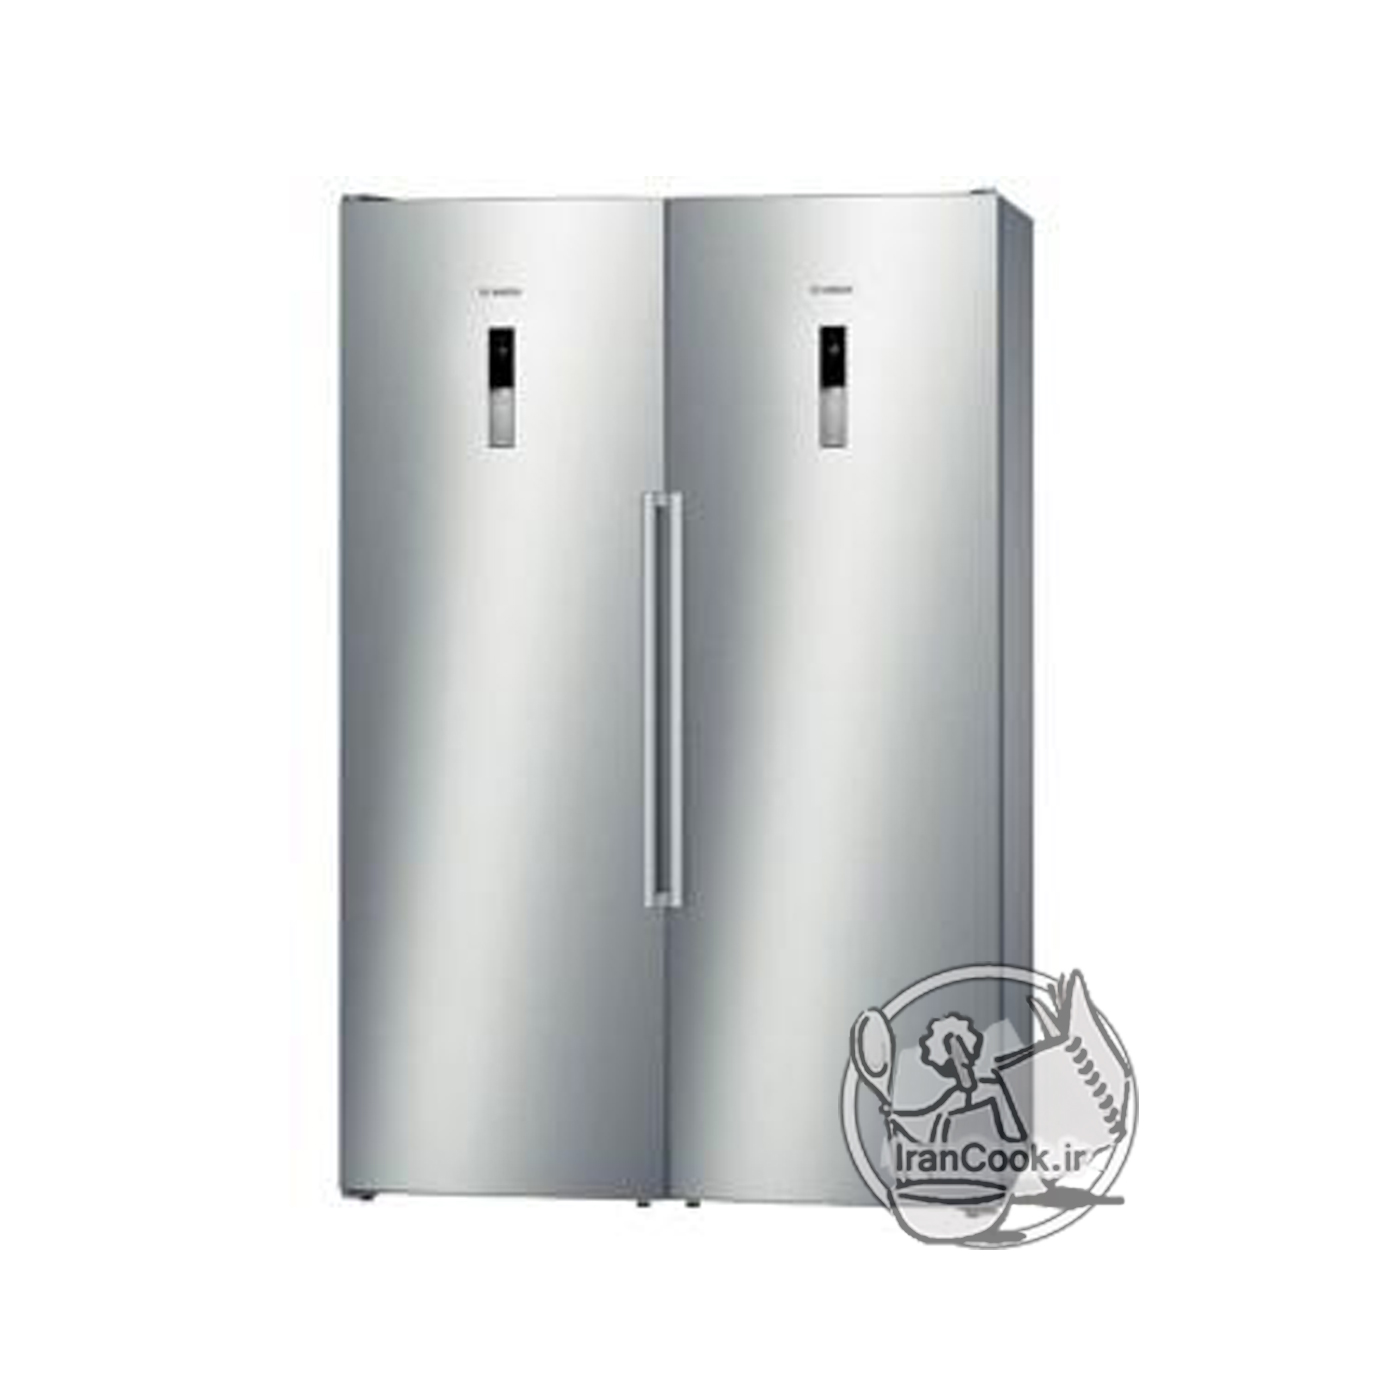 یخچال فریزر دوقلو BOSCH مدل KSV36BI304